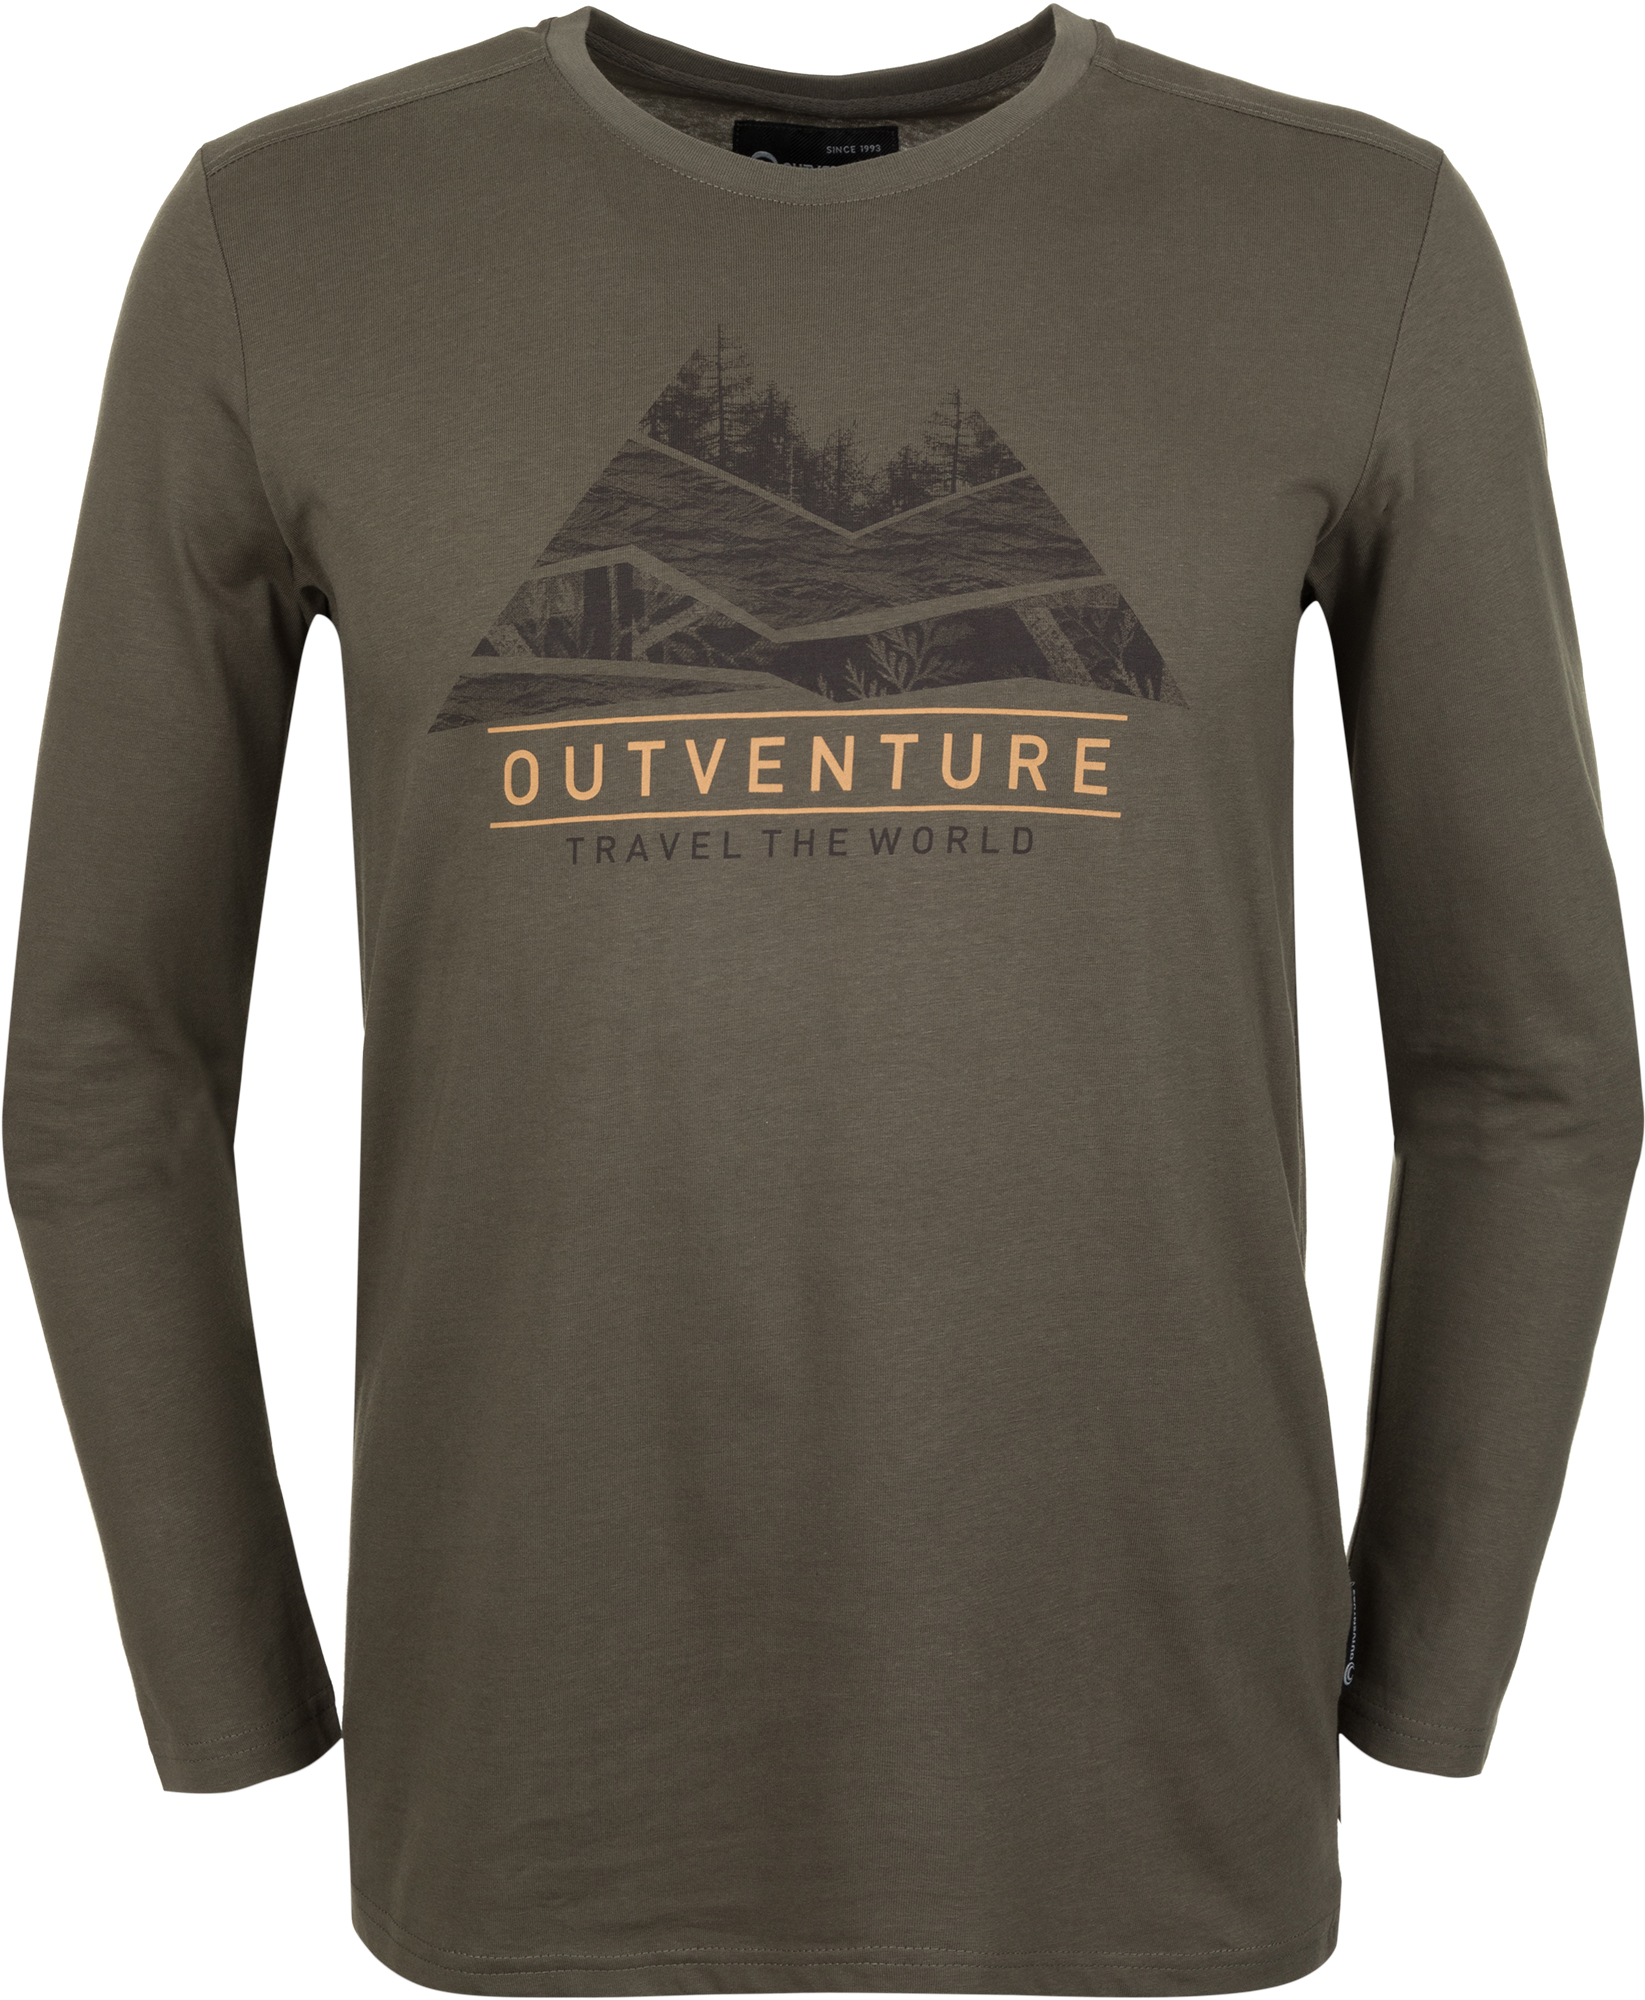 Outventure Футболка с длинным рукавом мужская Outventure, размер 52